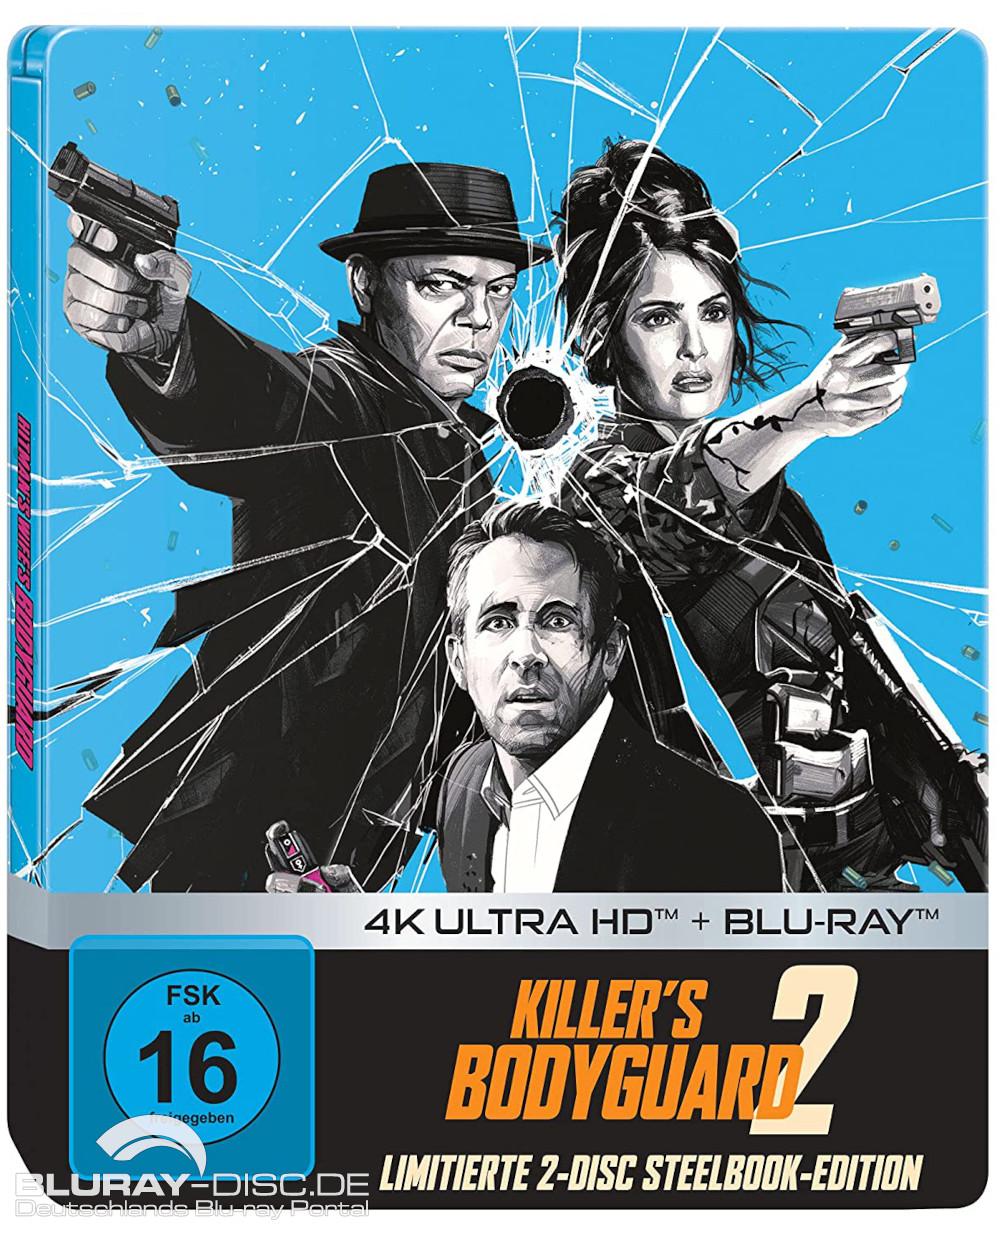 Killers-Bodyguard-2-Steelbook-Galerie-01.jpg